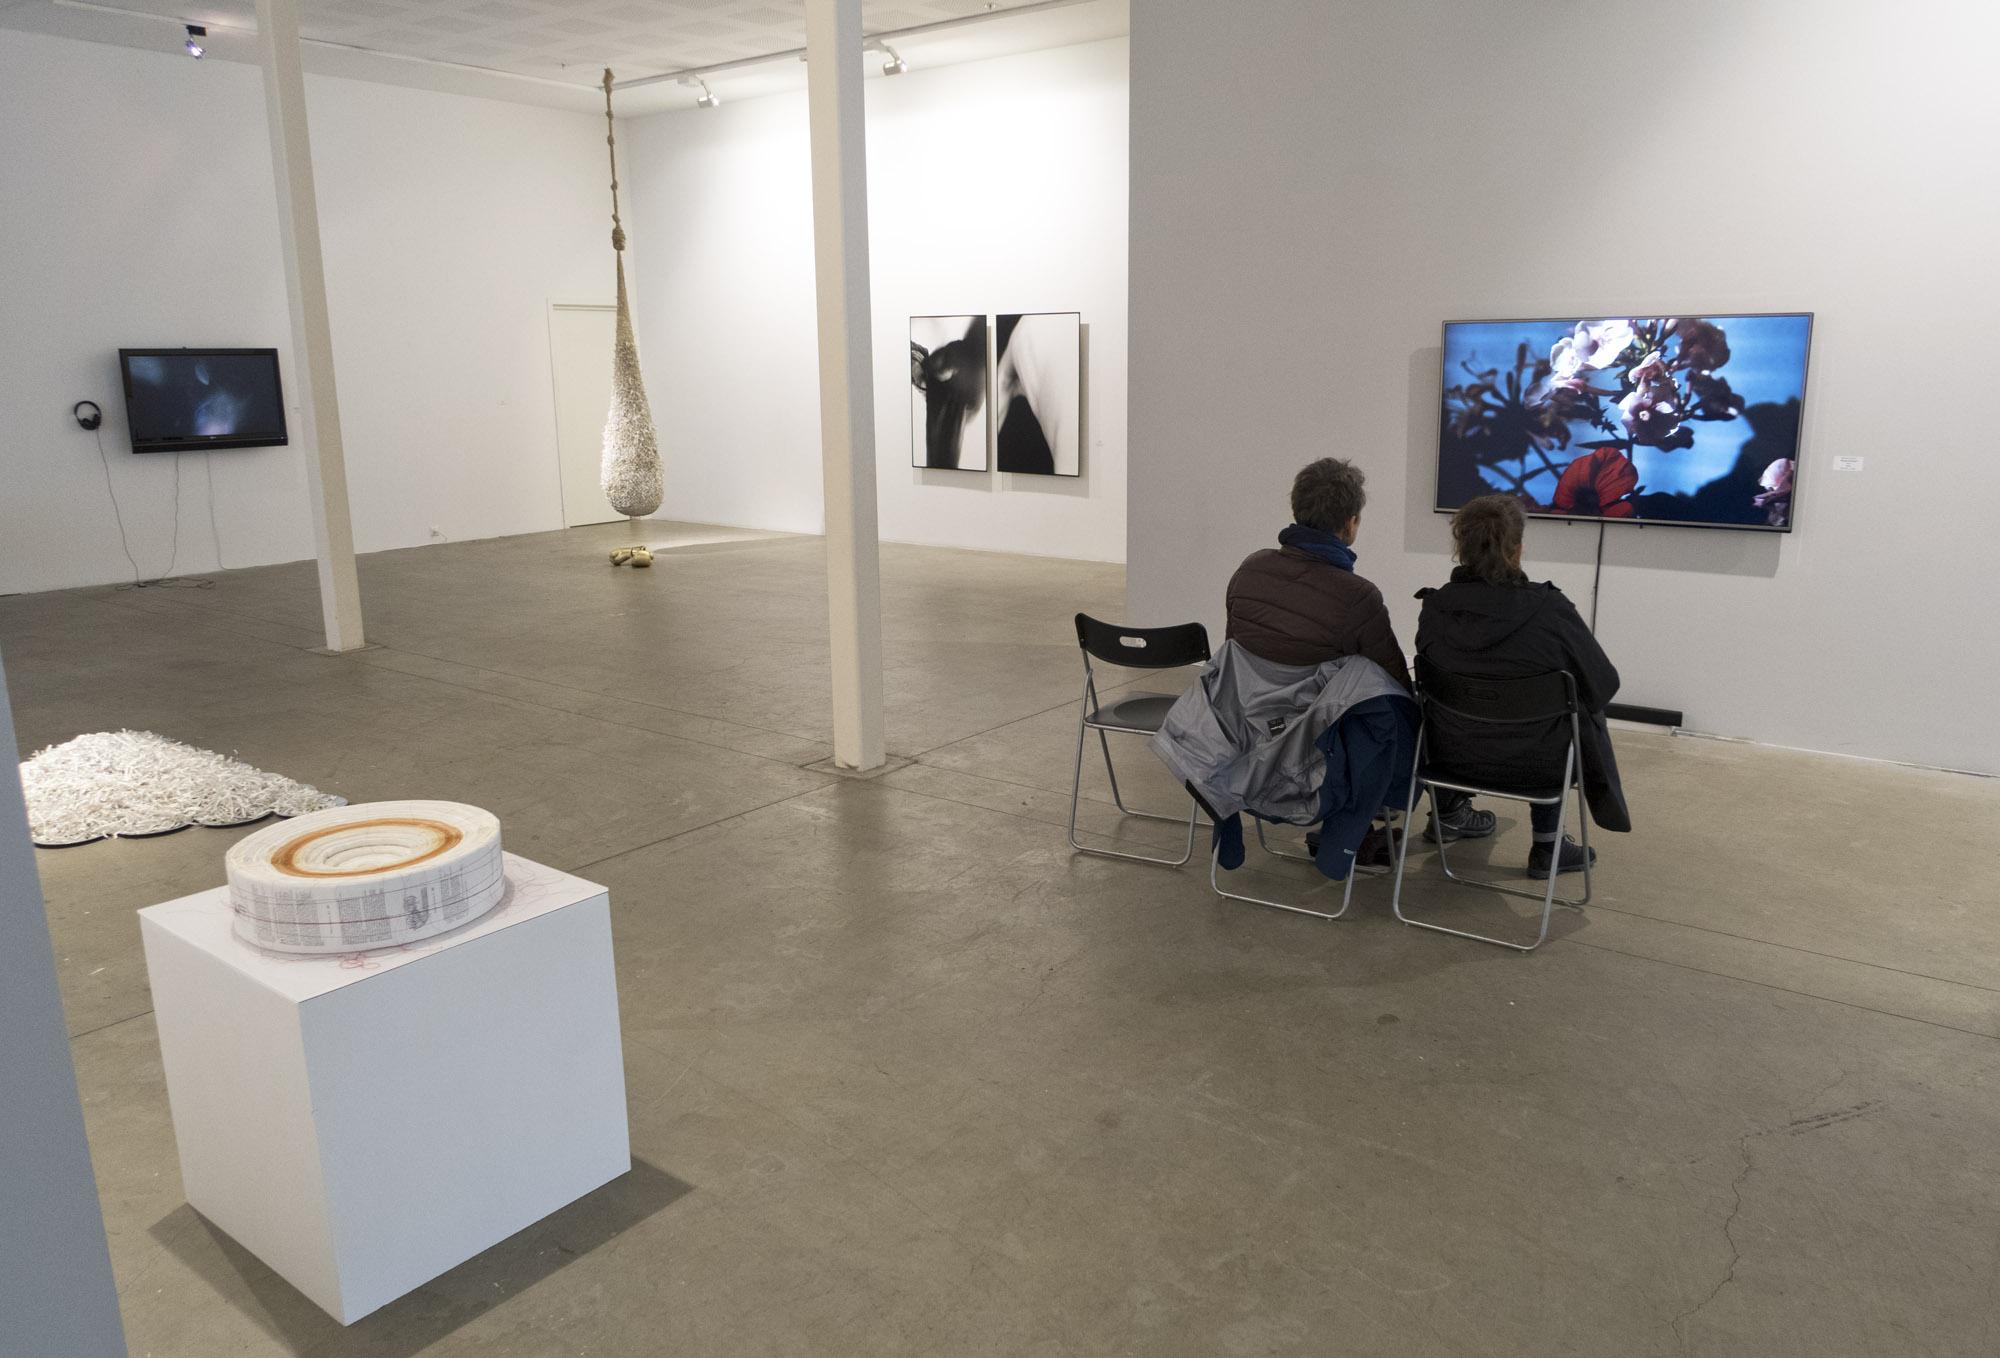 2017 from exhibition Galleri S.E